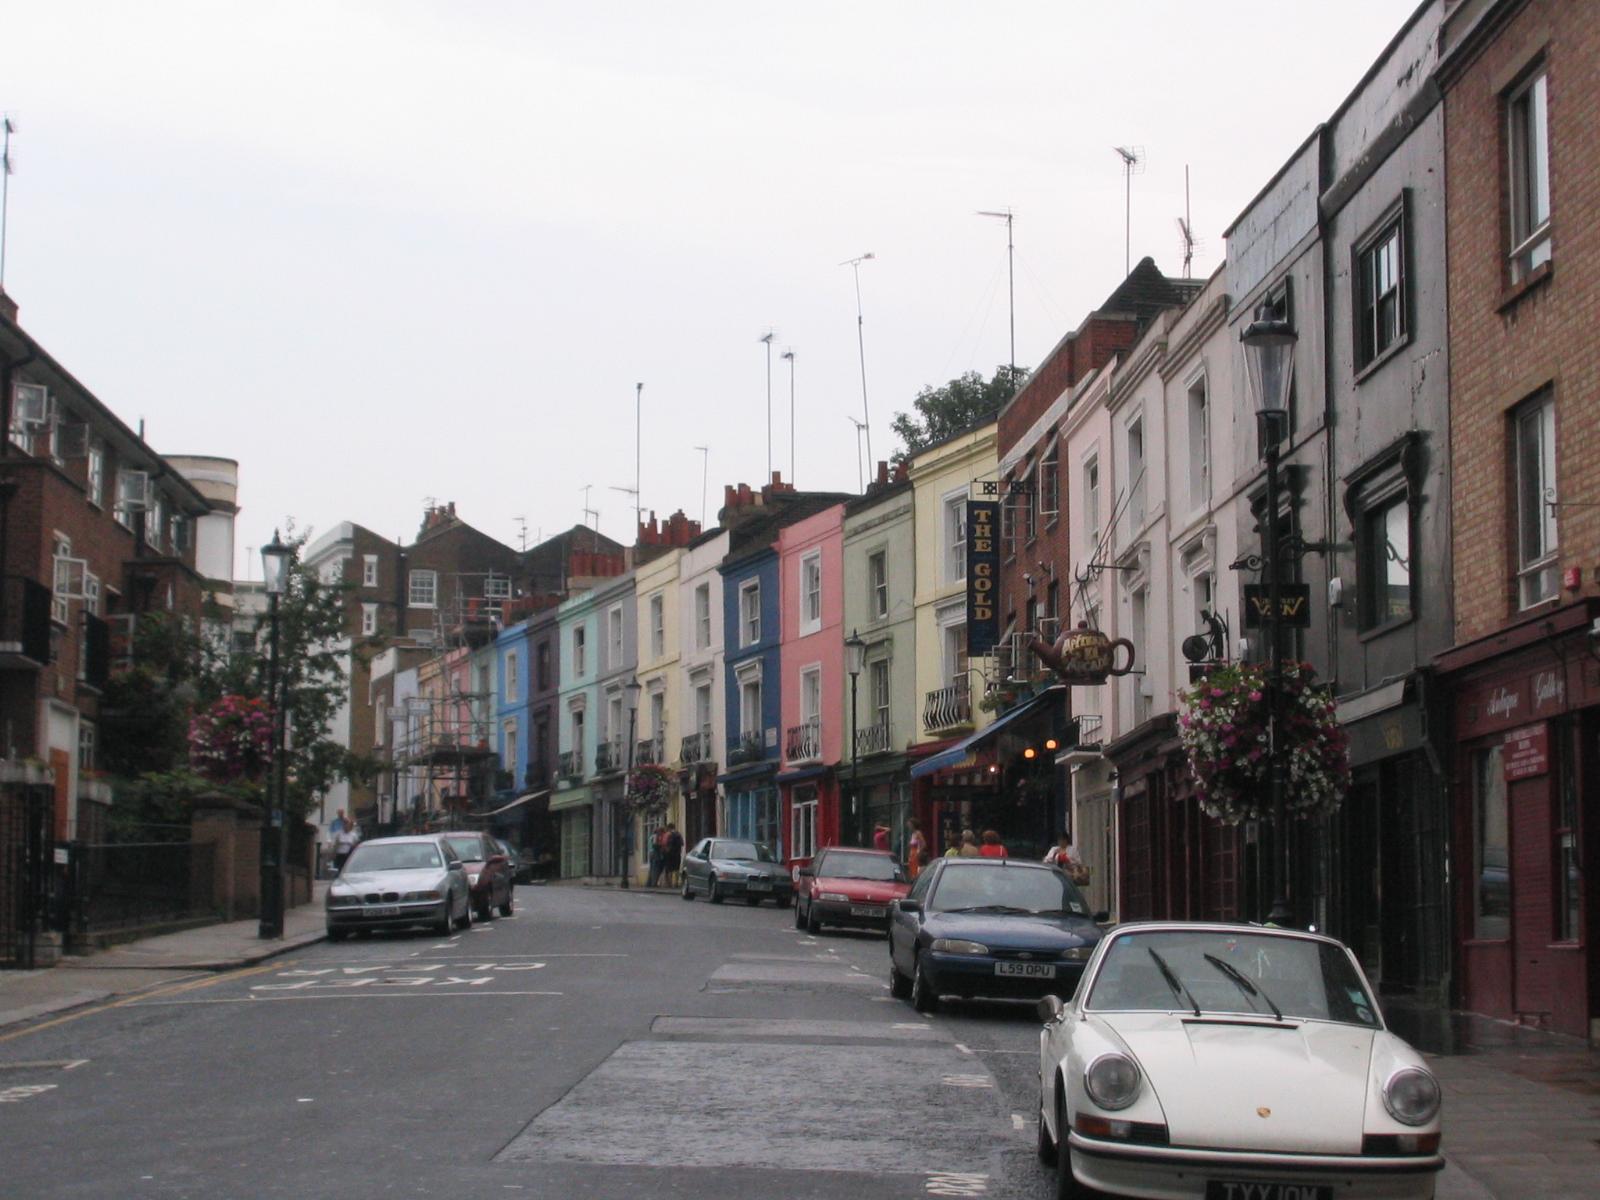 Notting Hill Image